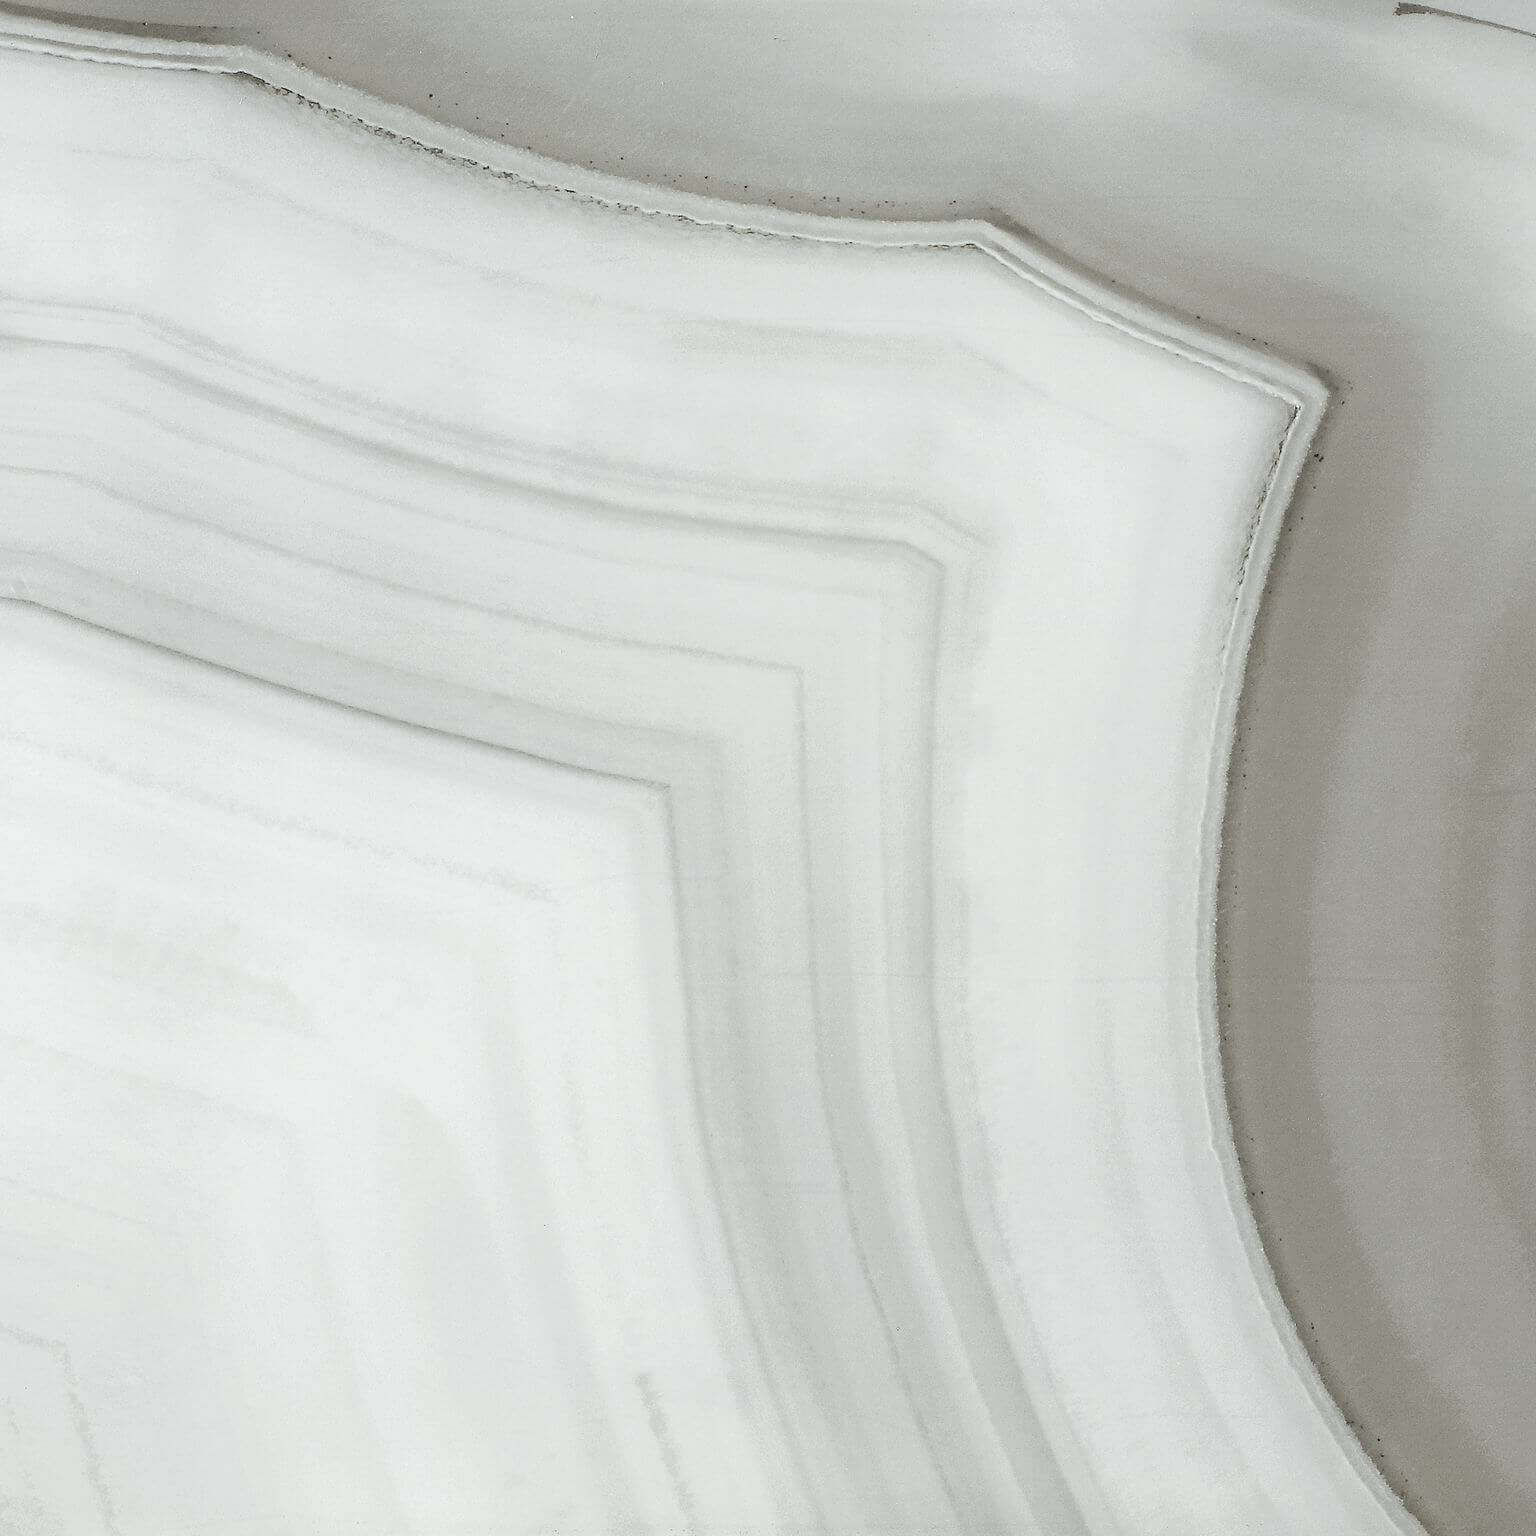 Marble tiles flooring  light grey agate porcelain tiles guangzhou